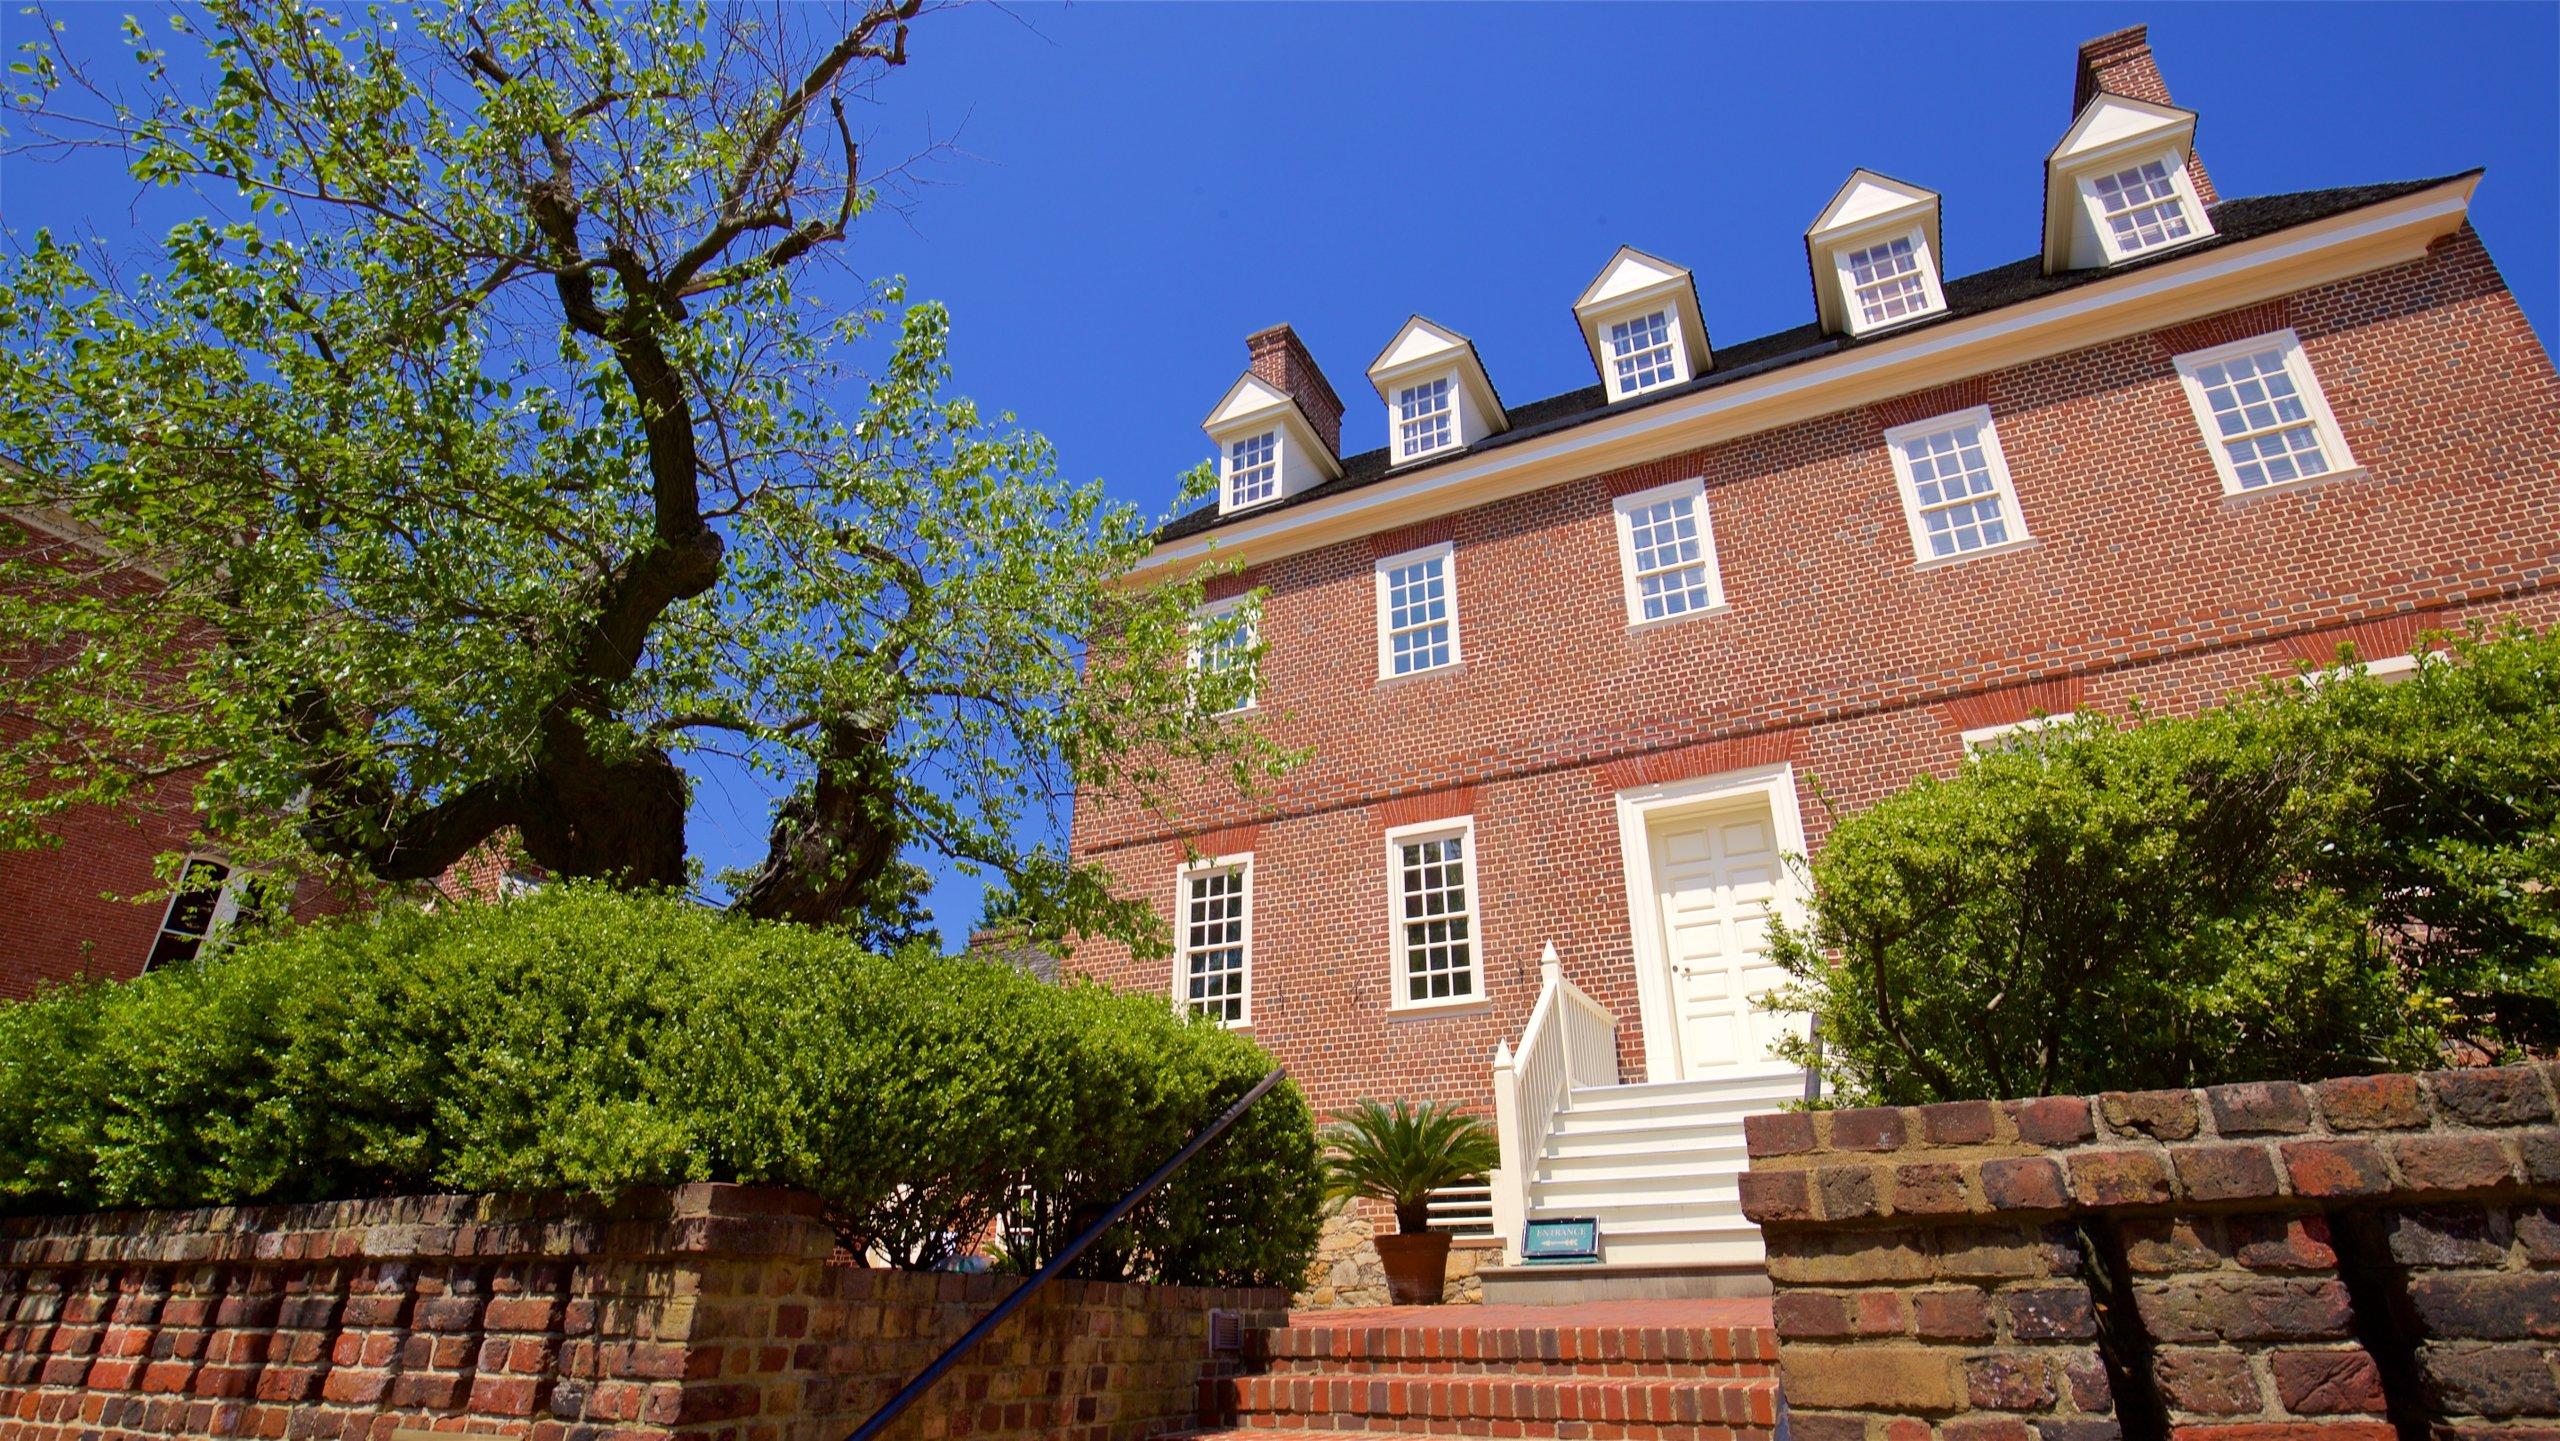 William Paca House, Annapolis, Maryland, United States of America